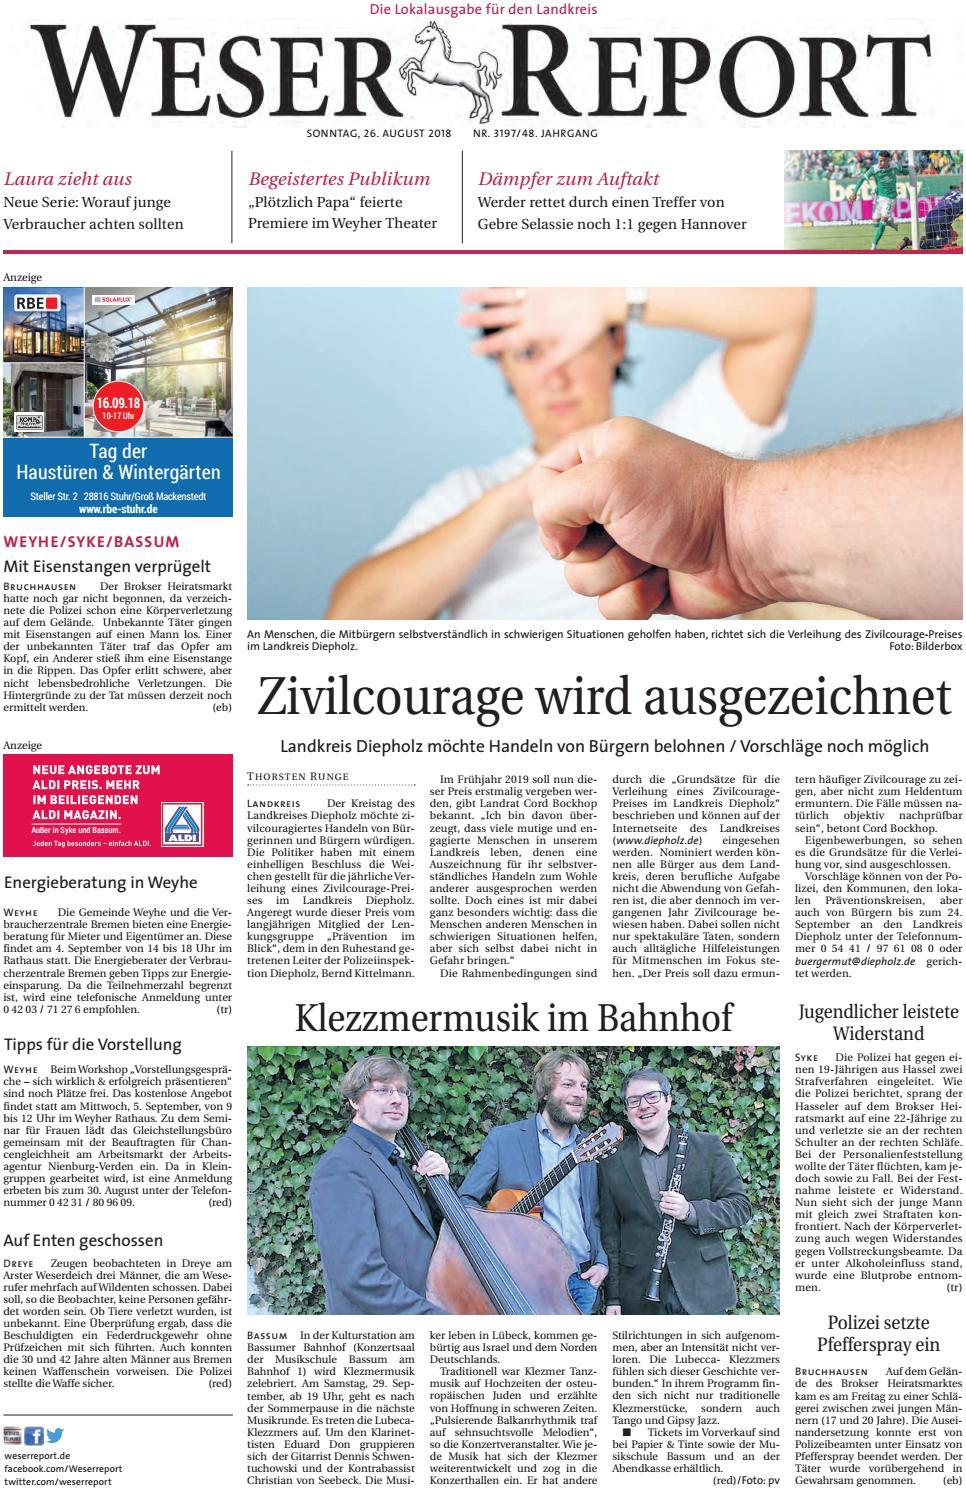 Weser Report - Weyhe, Syke, Bassum Vom 26.08.2018 By Kps